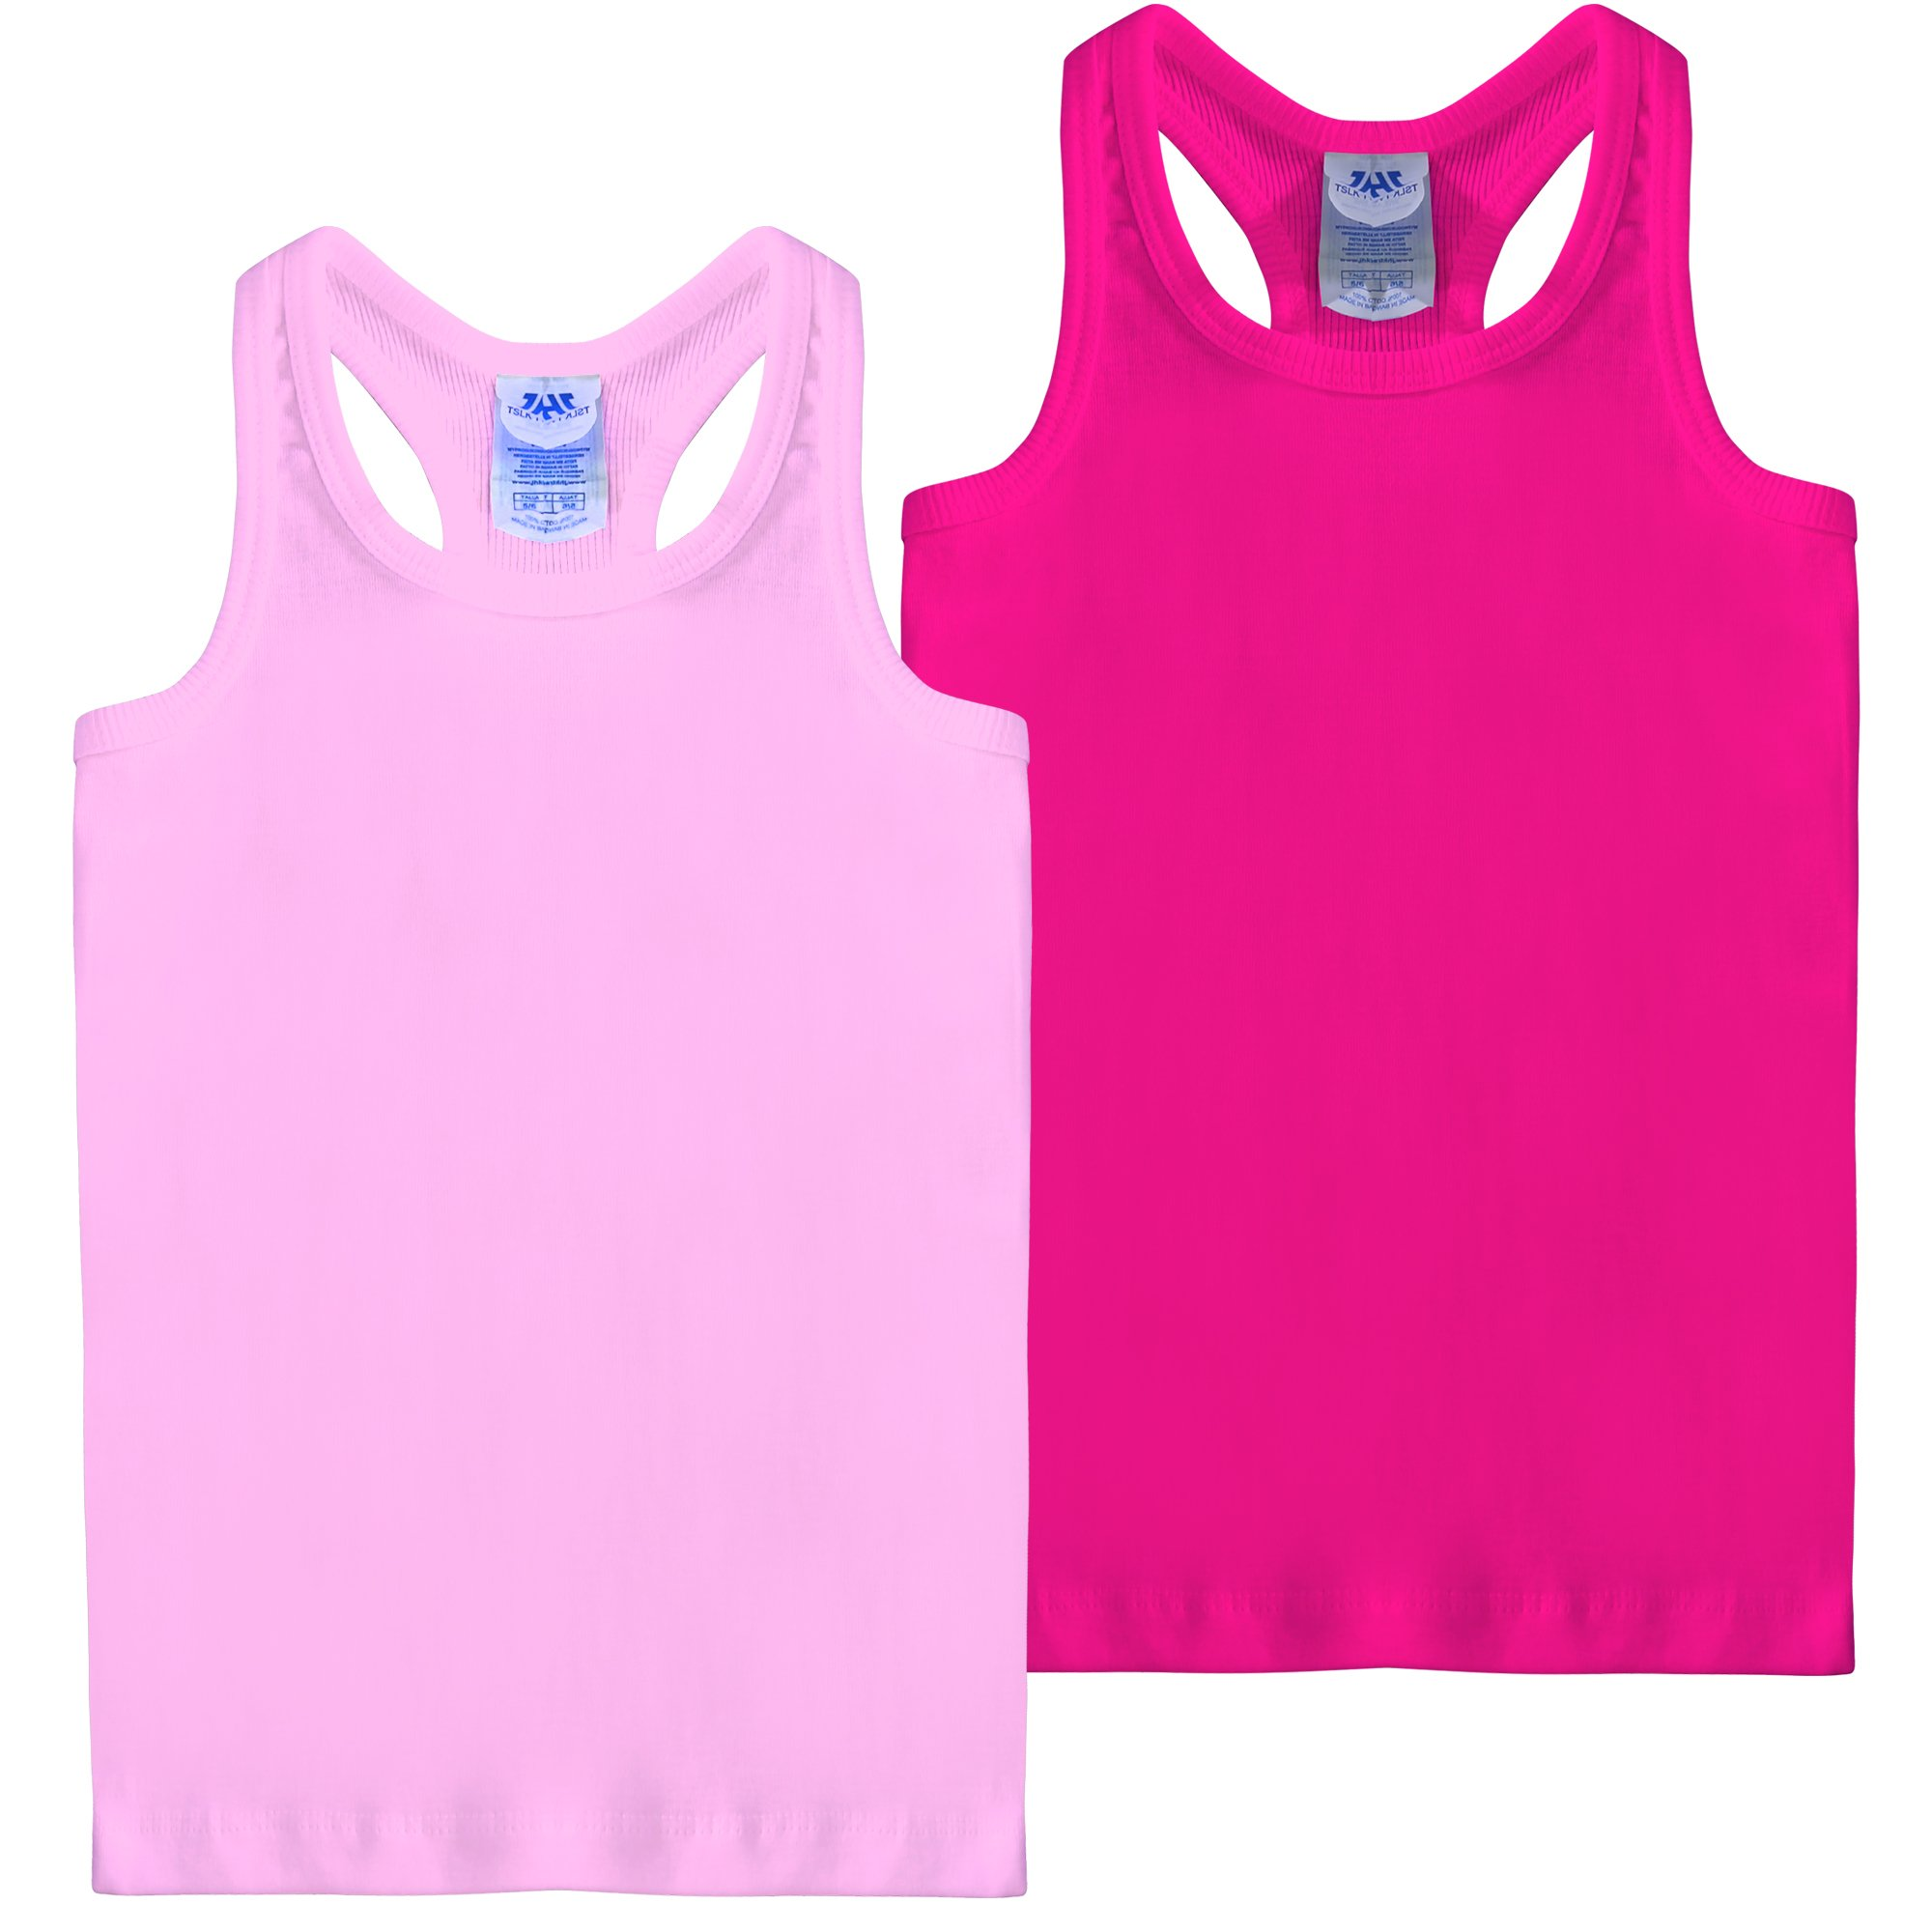 FRESH TEE Girls' Racer Back Tank Top Tunic (Girl 5/6, 2pk Pink/ Fuchsia)